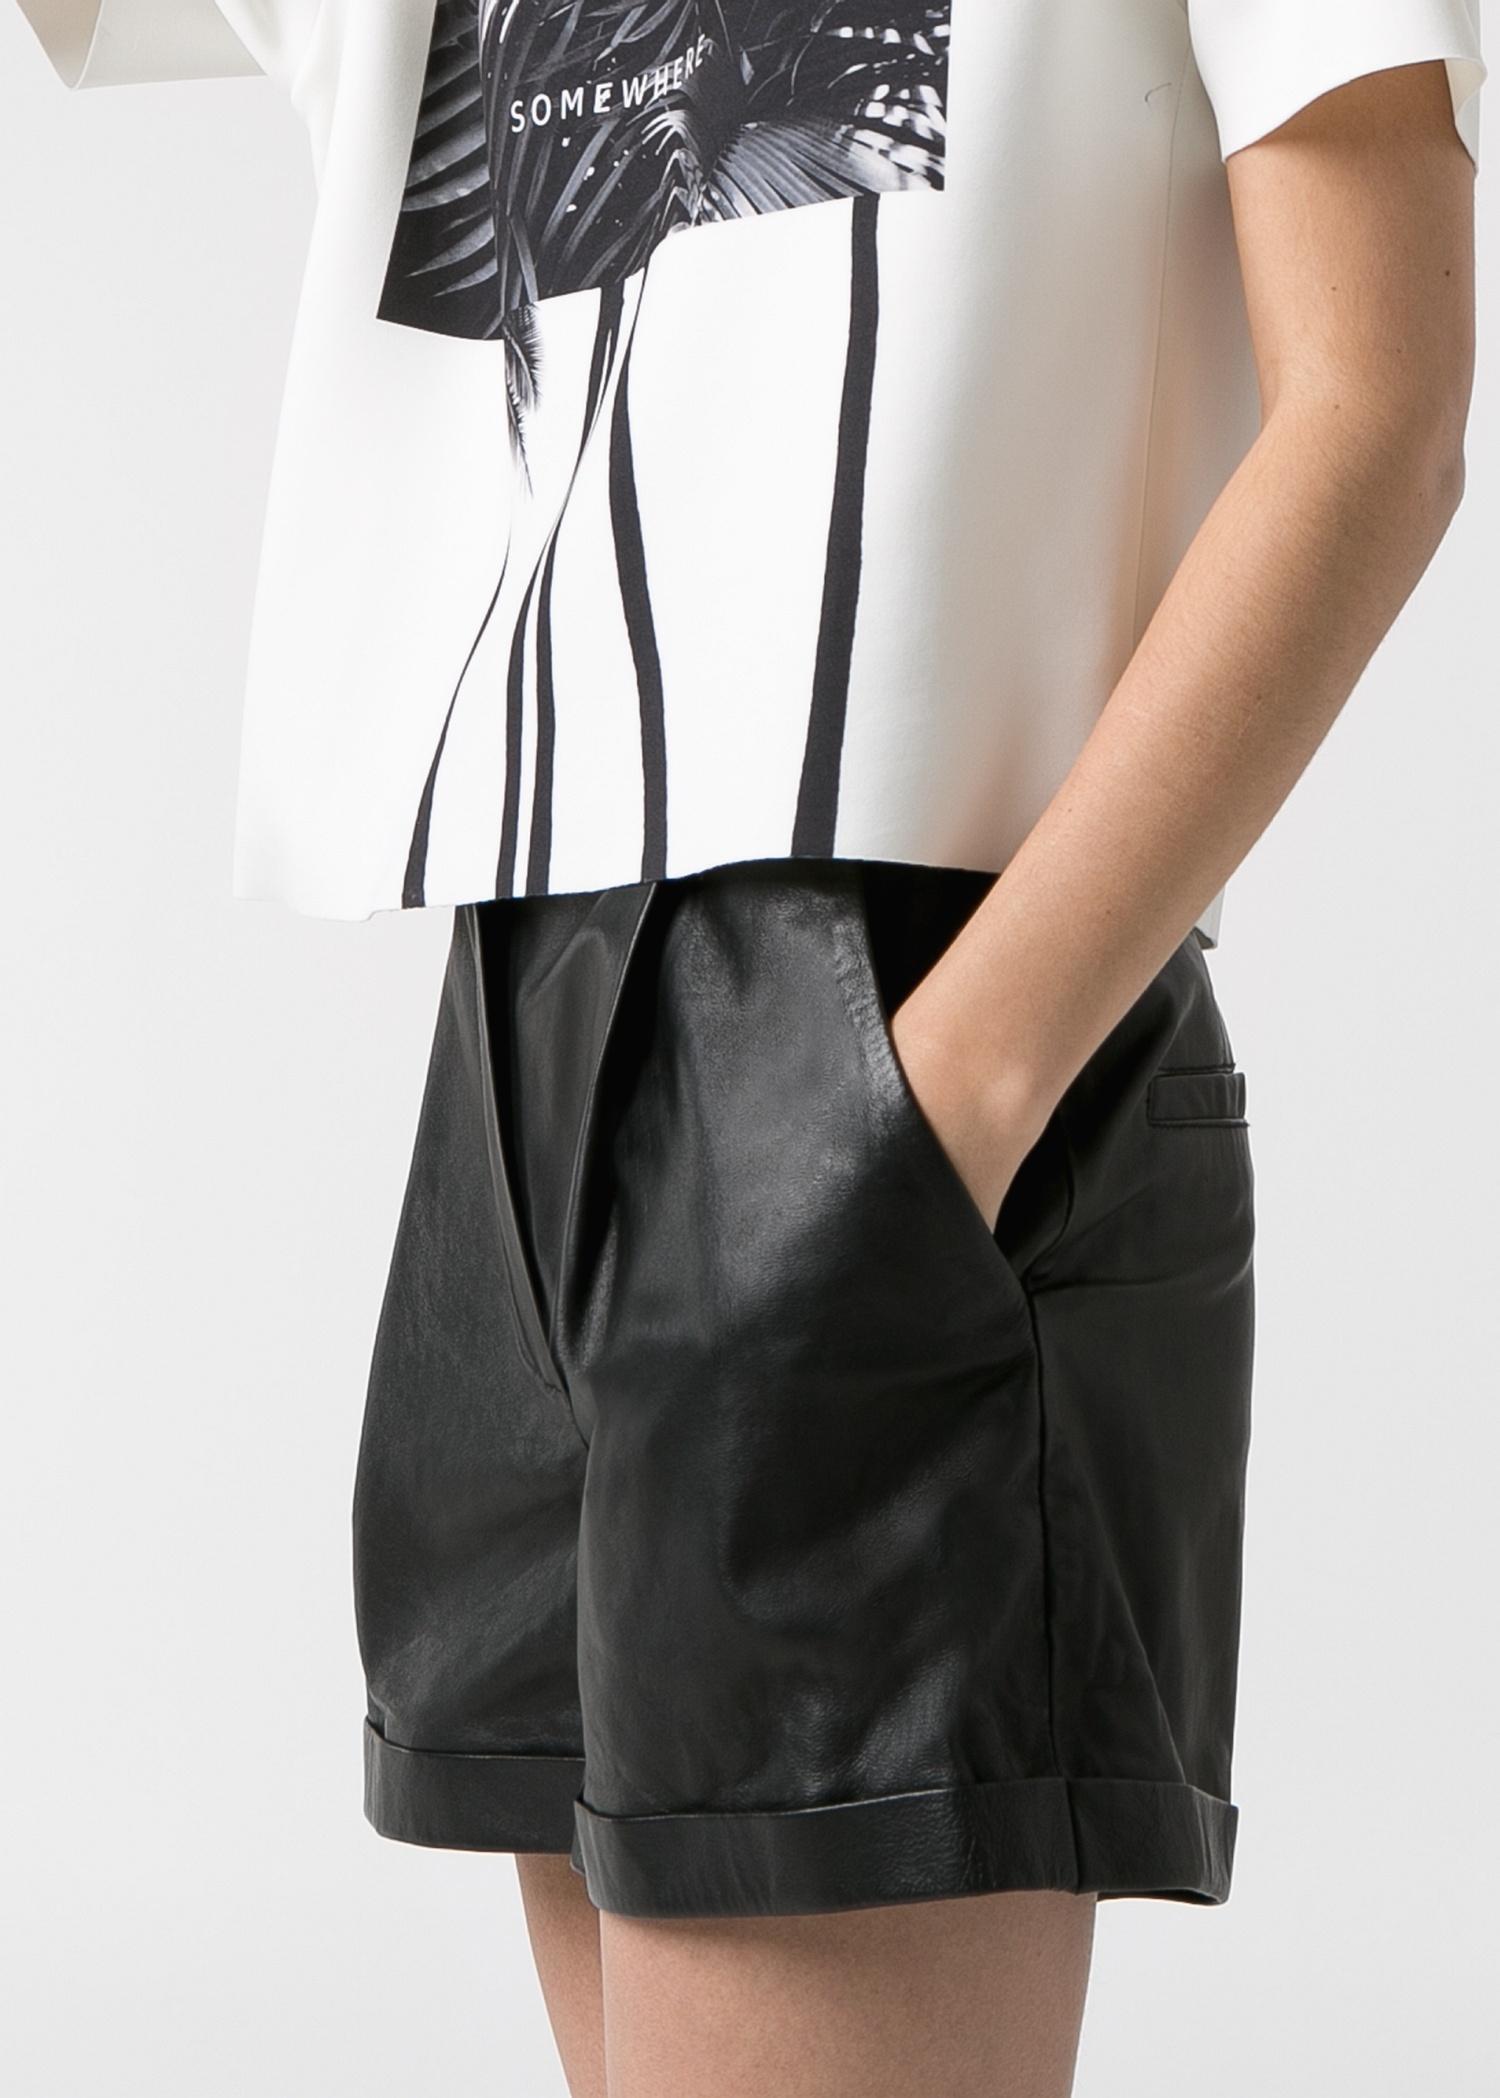 Mango High-Waist Leather Shorts in Black | Lyst